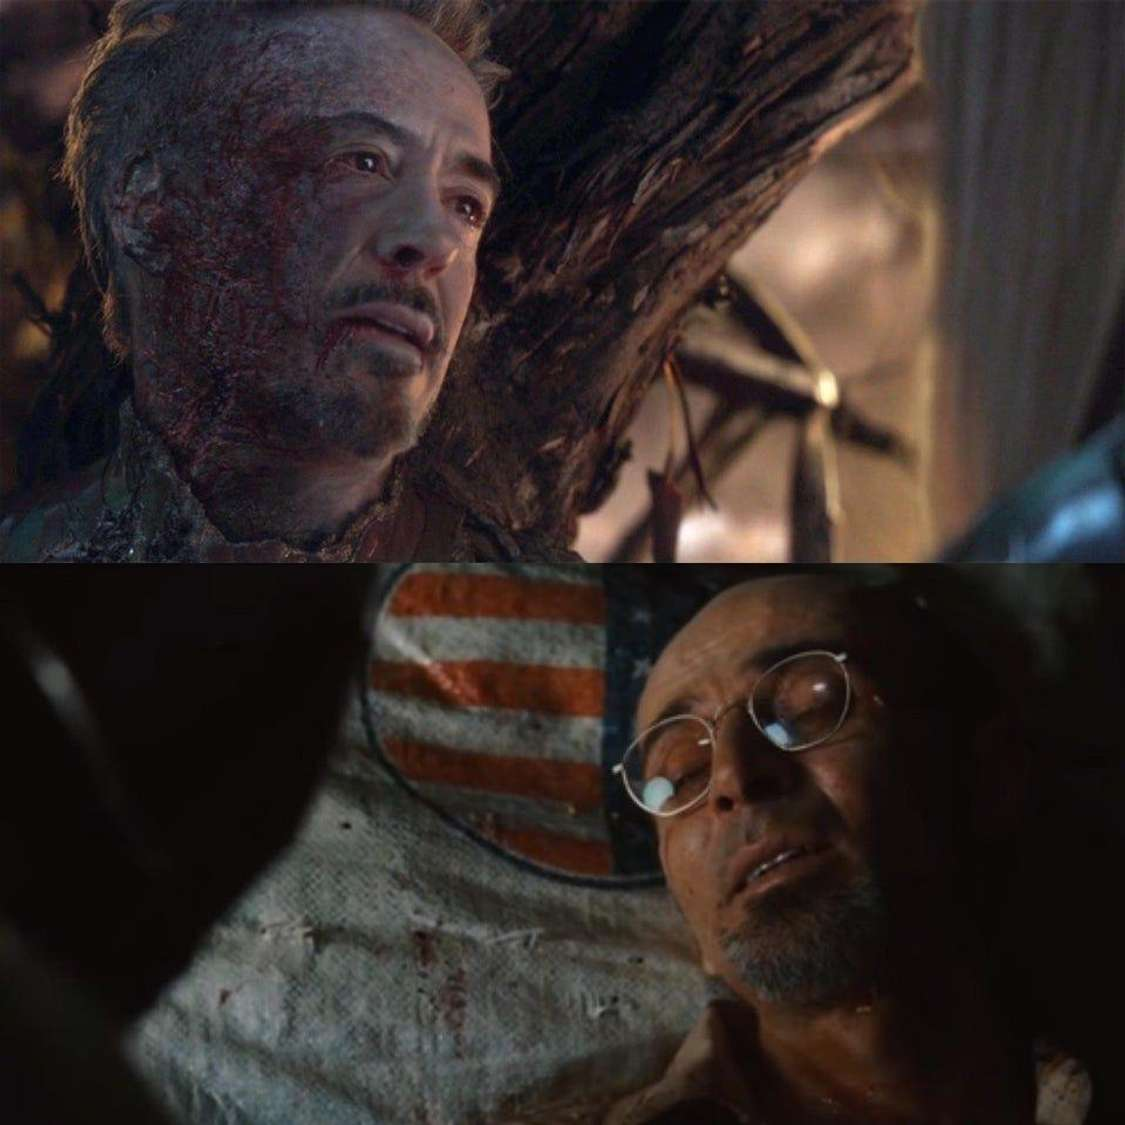 The parallel scenes